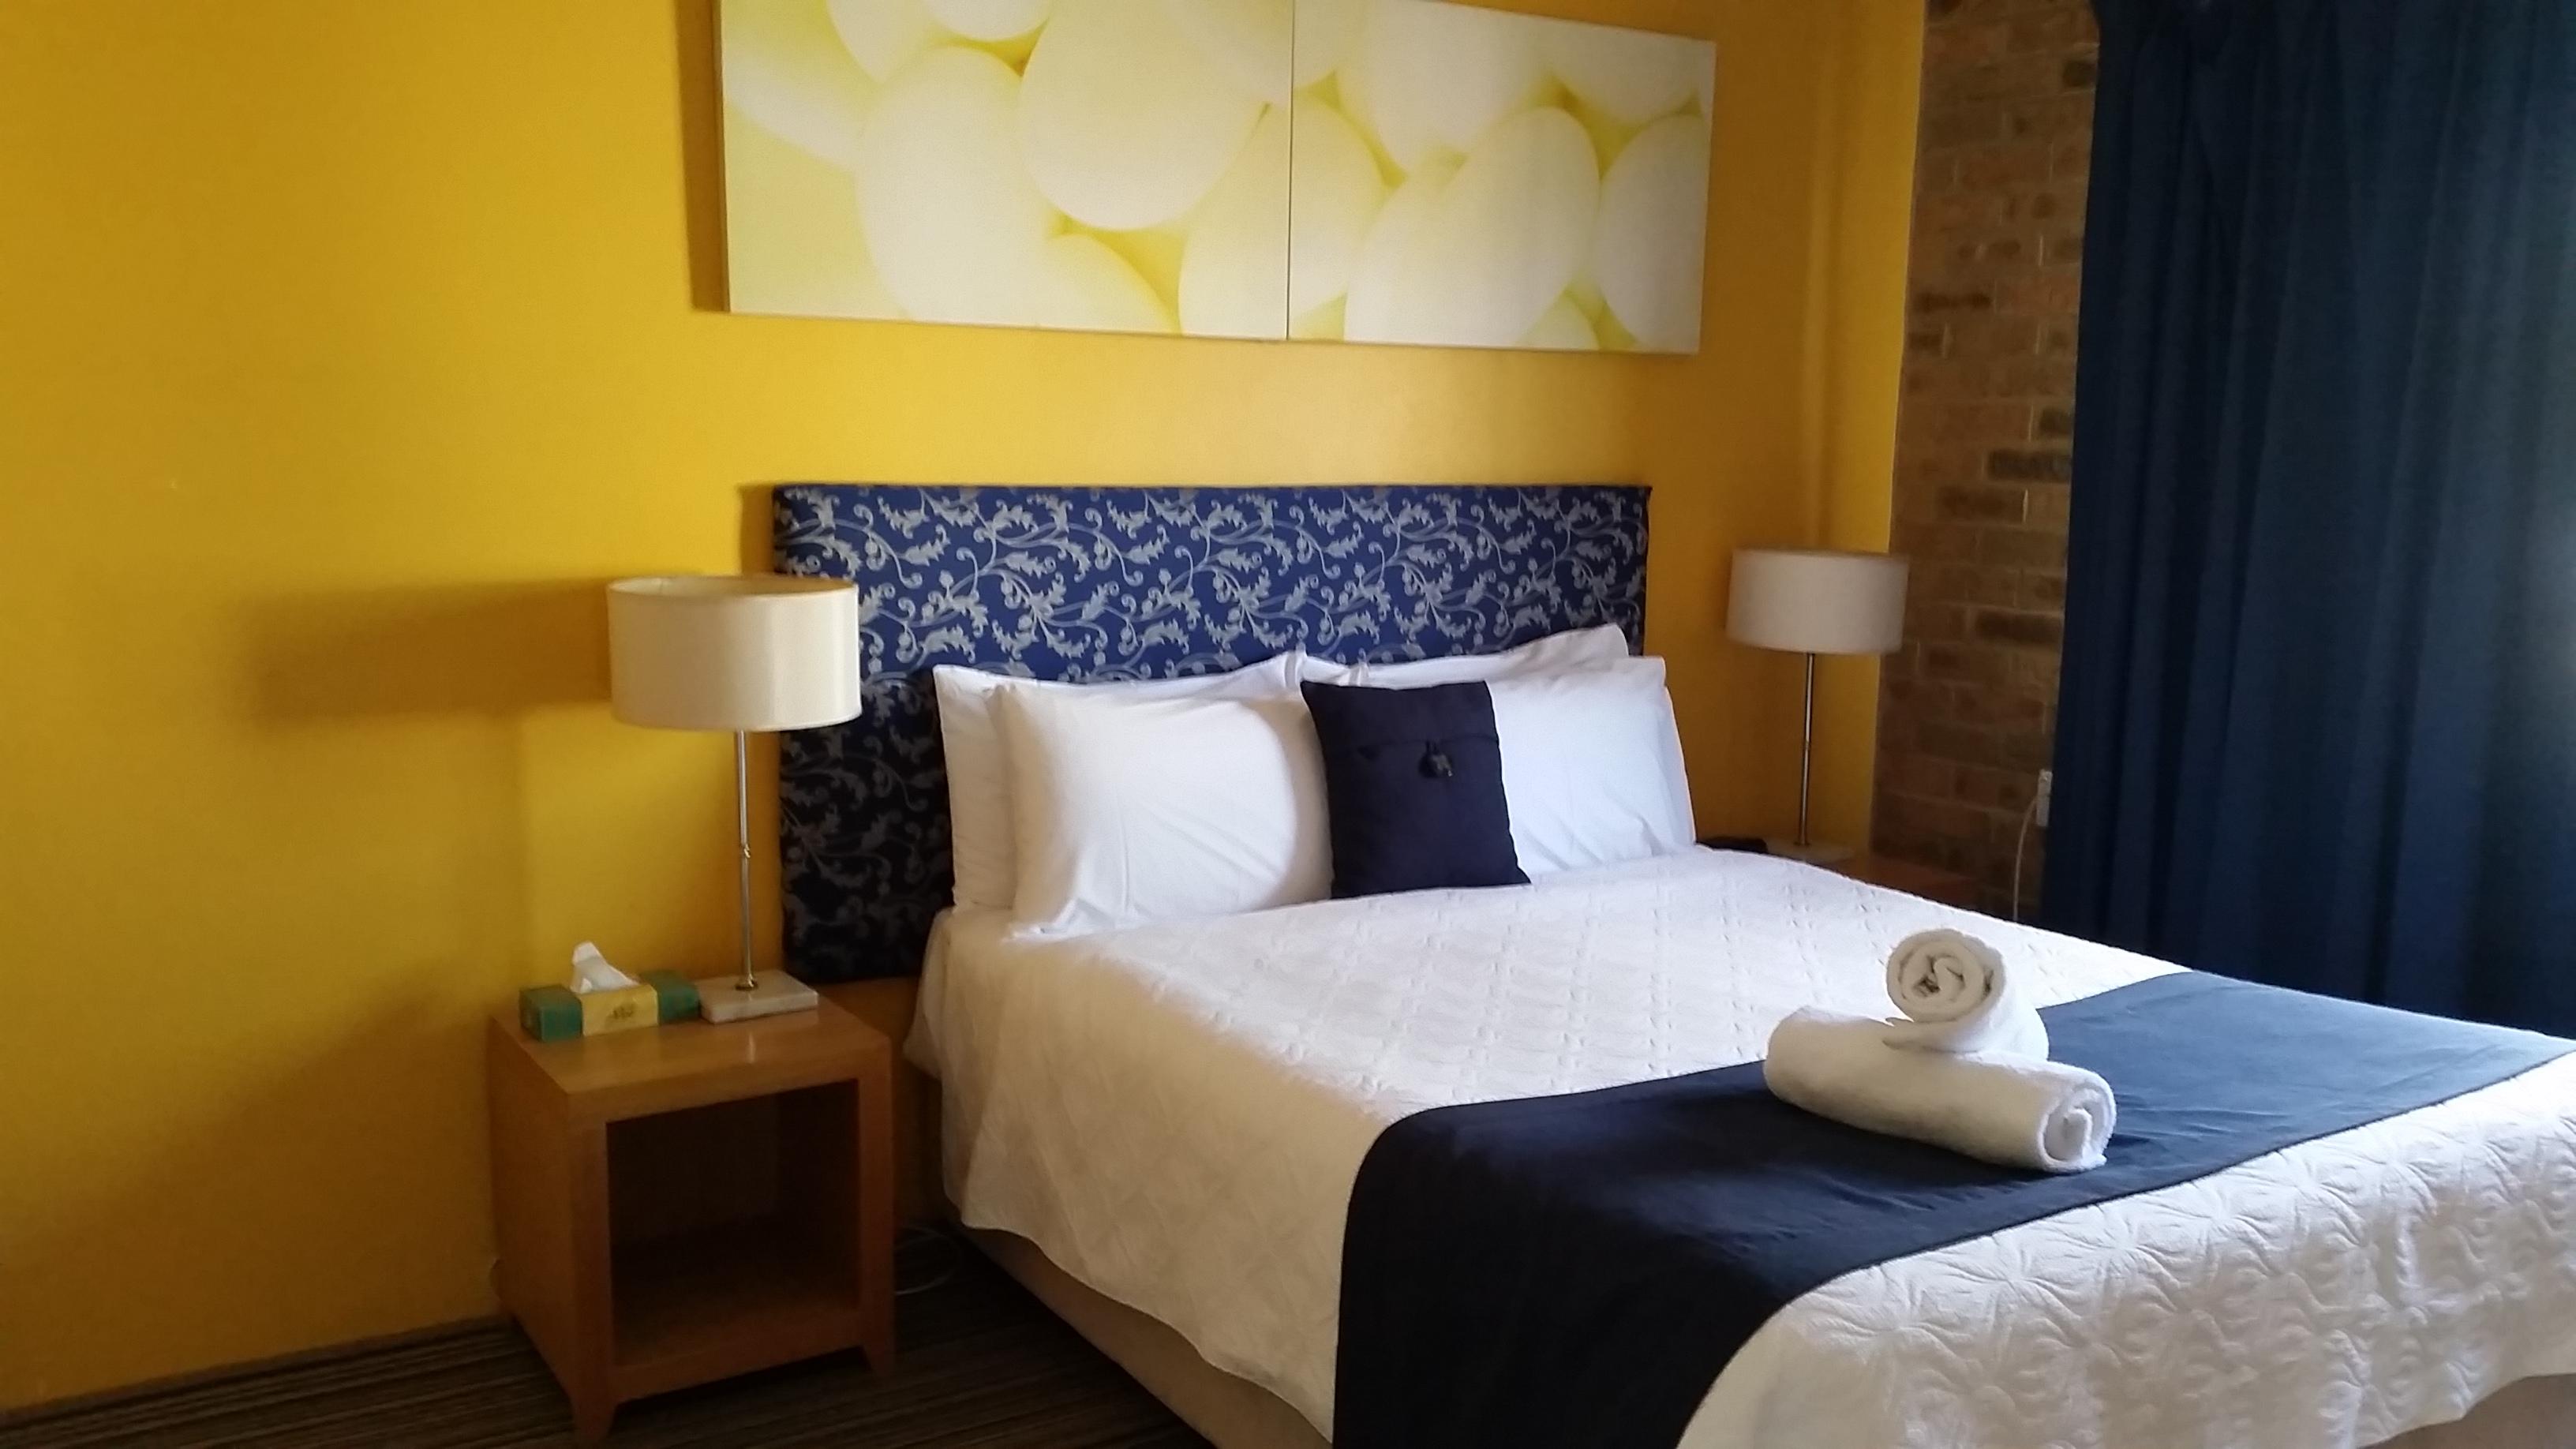 2 bed unit bed